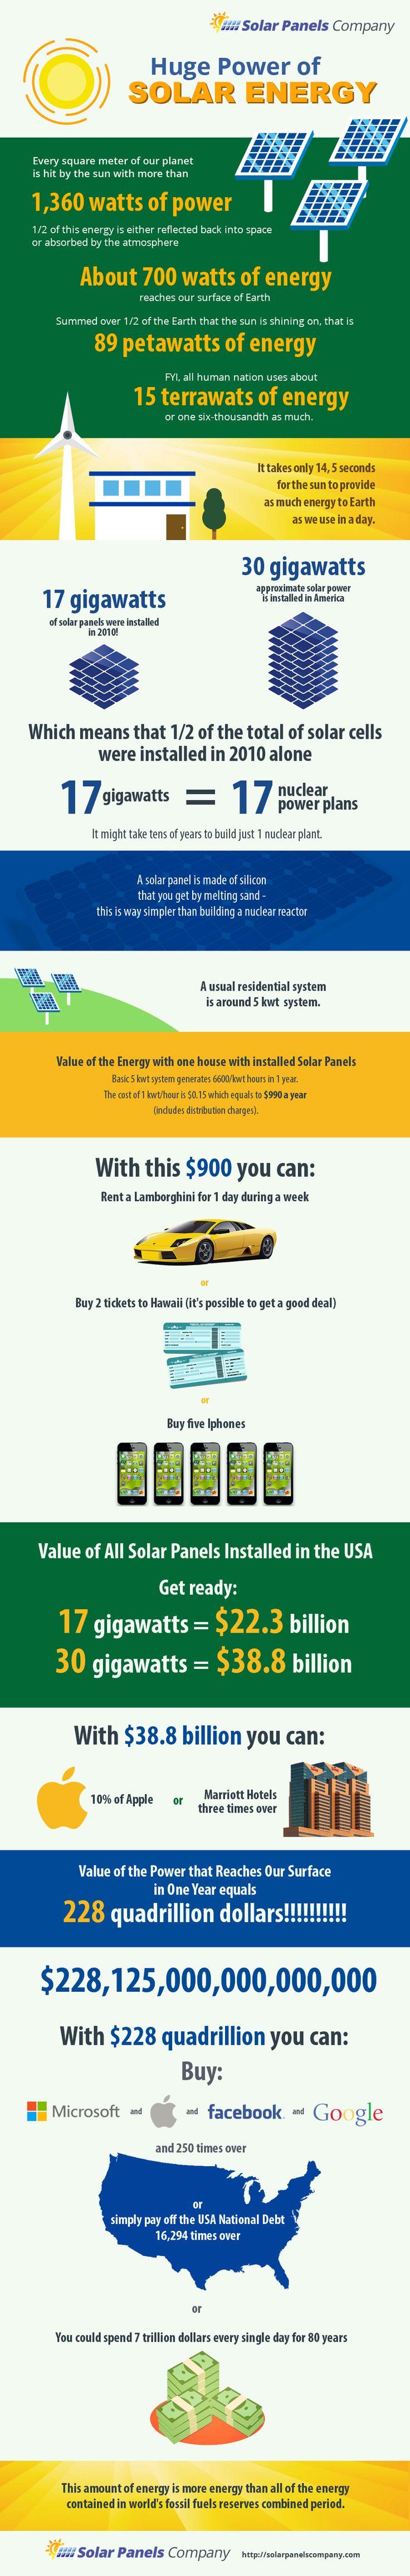 Huge Power of Solar Energy #Infographic #Energy #SolarEnergy